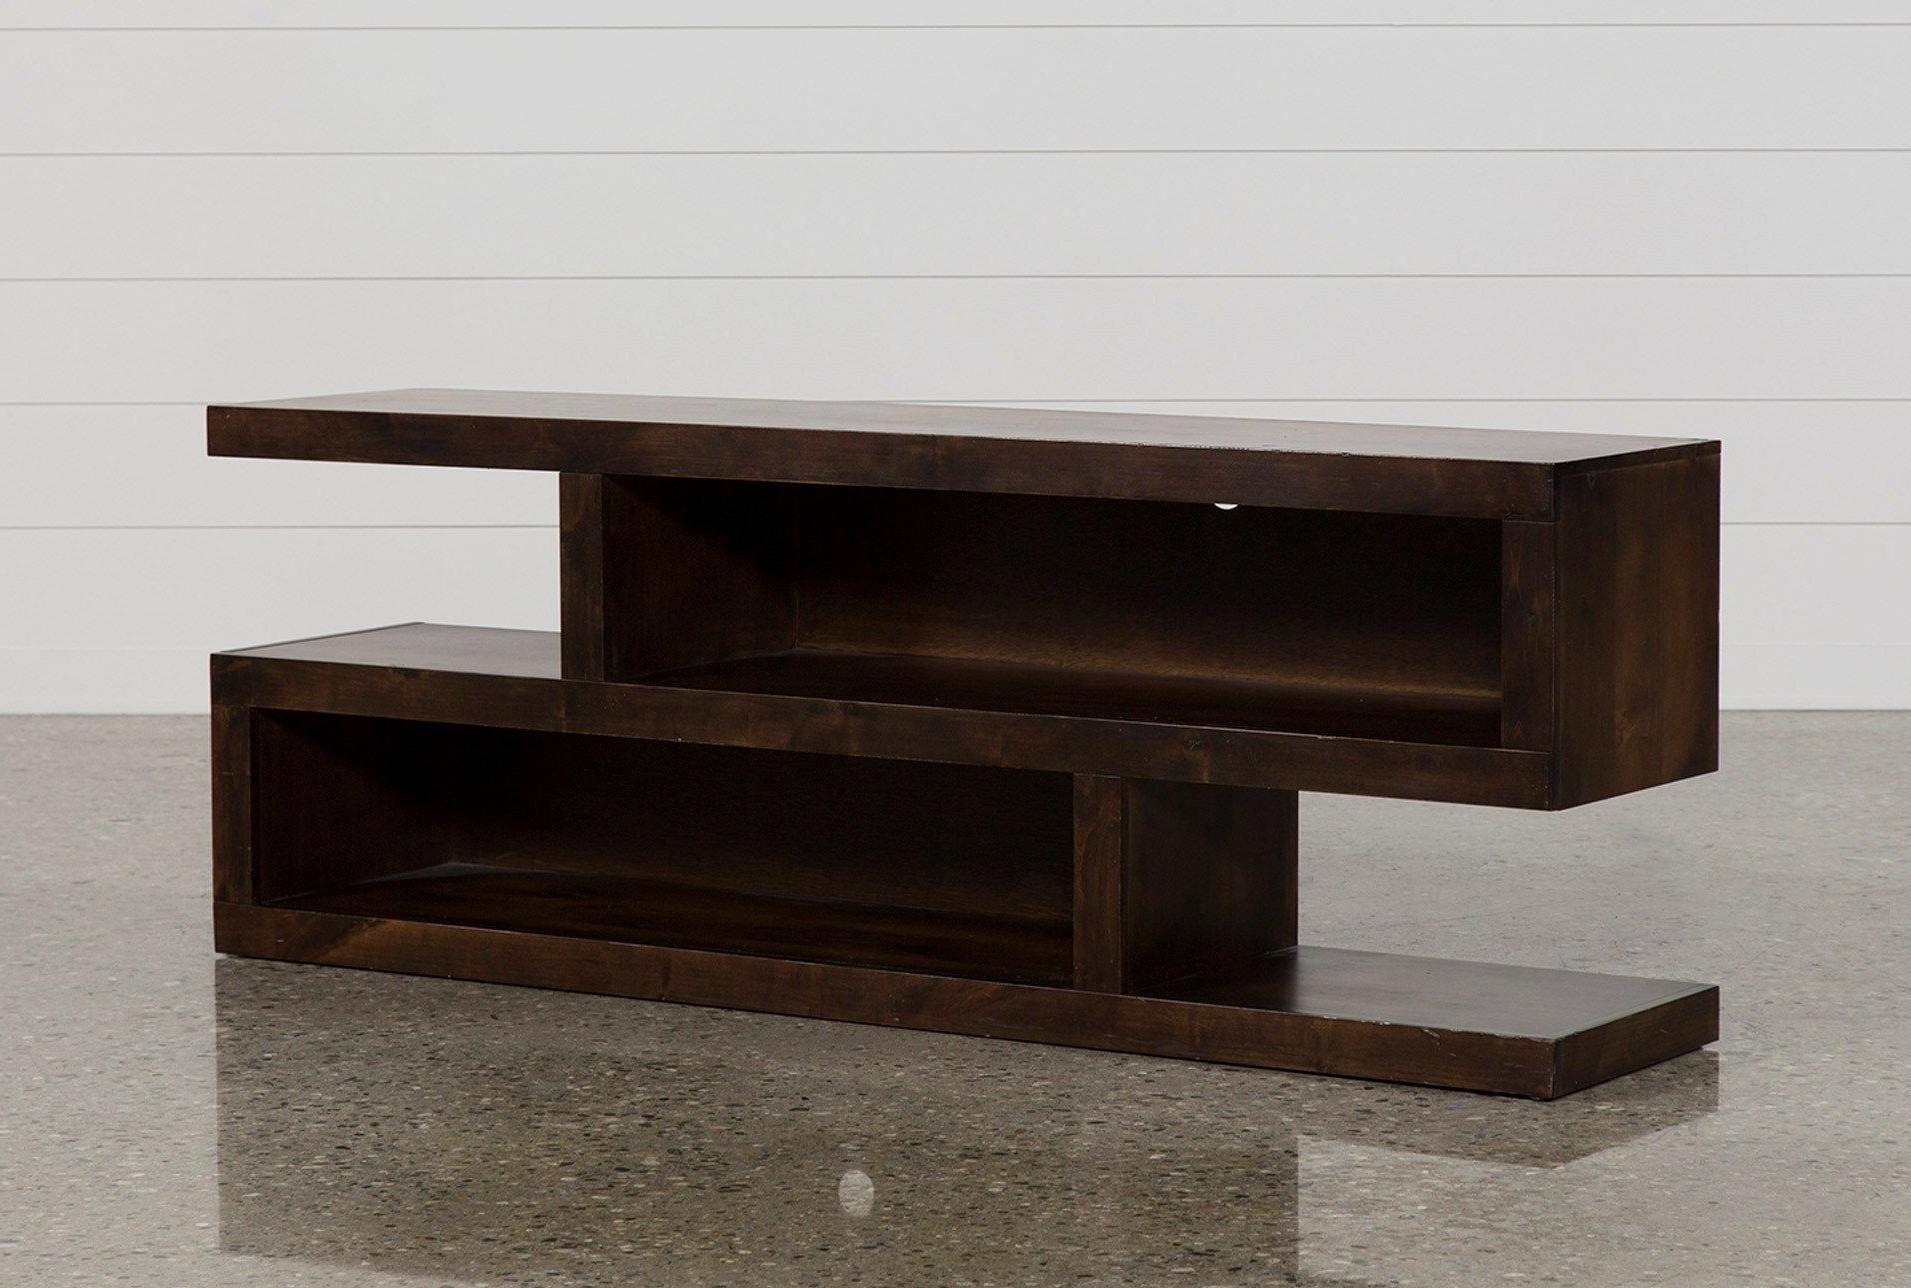 Walton 74 Inch Open Tv Stand | Ideas | Pinterest | Family Room, Room Intended For Walton 72 Inch Tv Stands (Gallery 3 of 20)